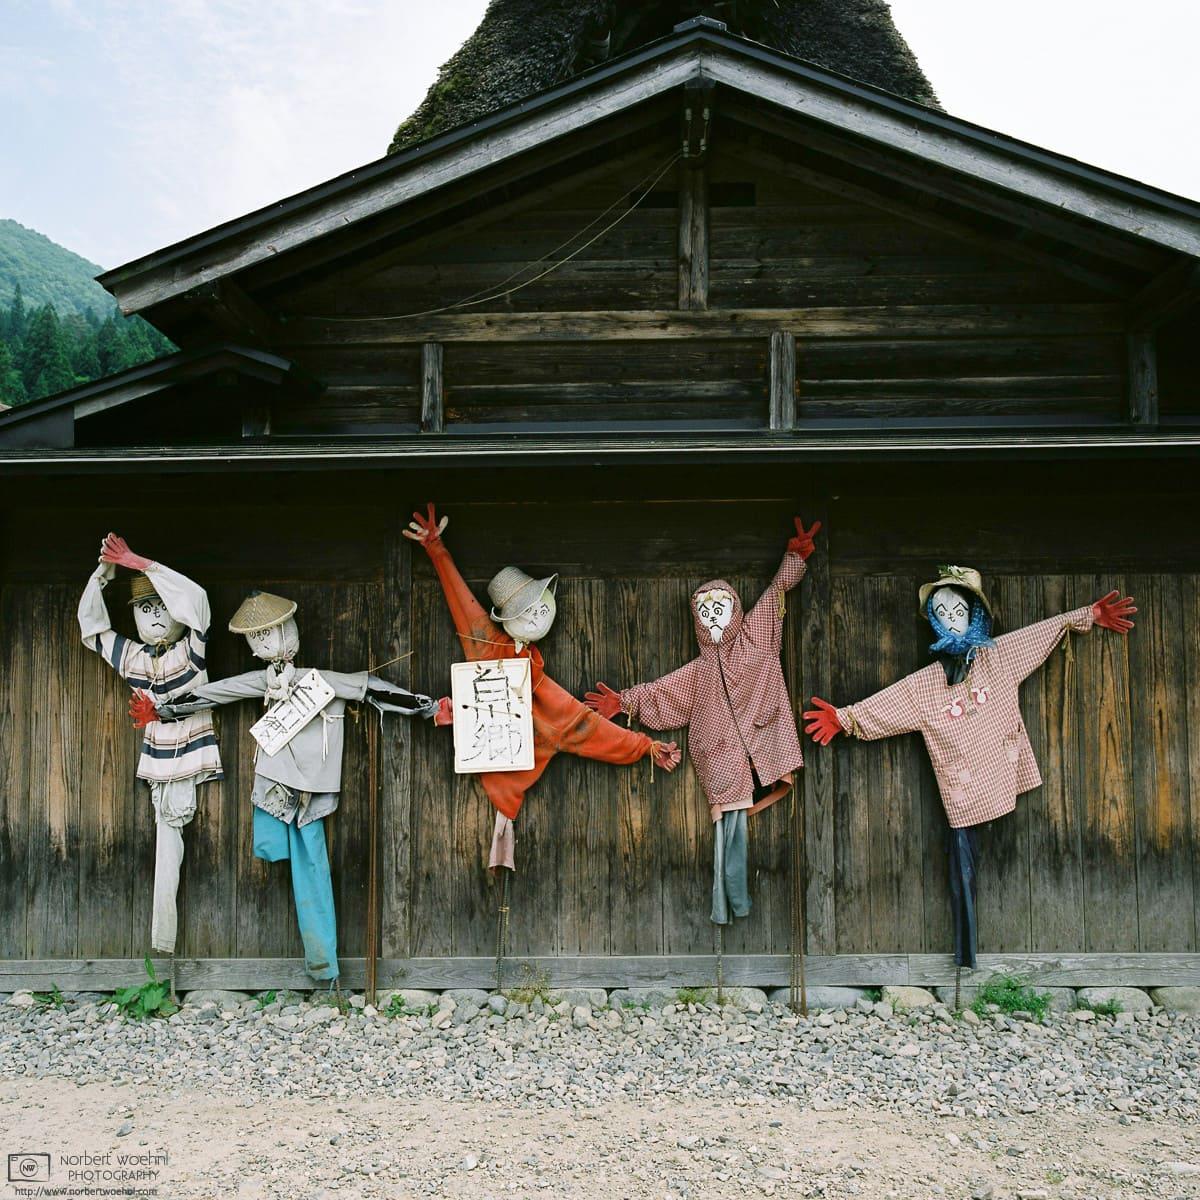 Dance of the Scarecrows, Ogimachi Village, Shirakawago, Gifu, Japan Photo